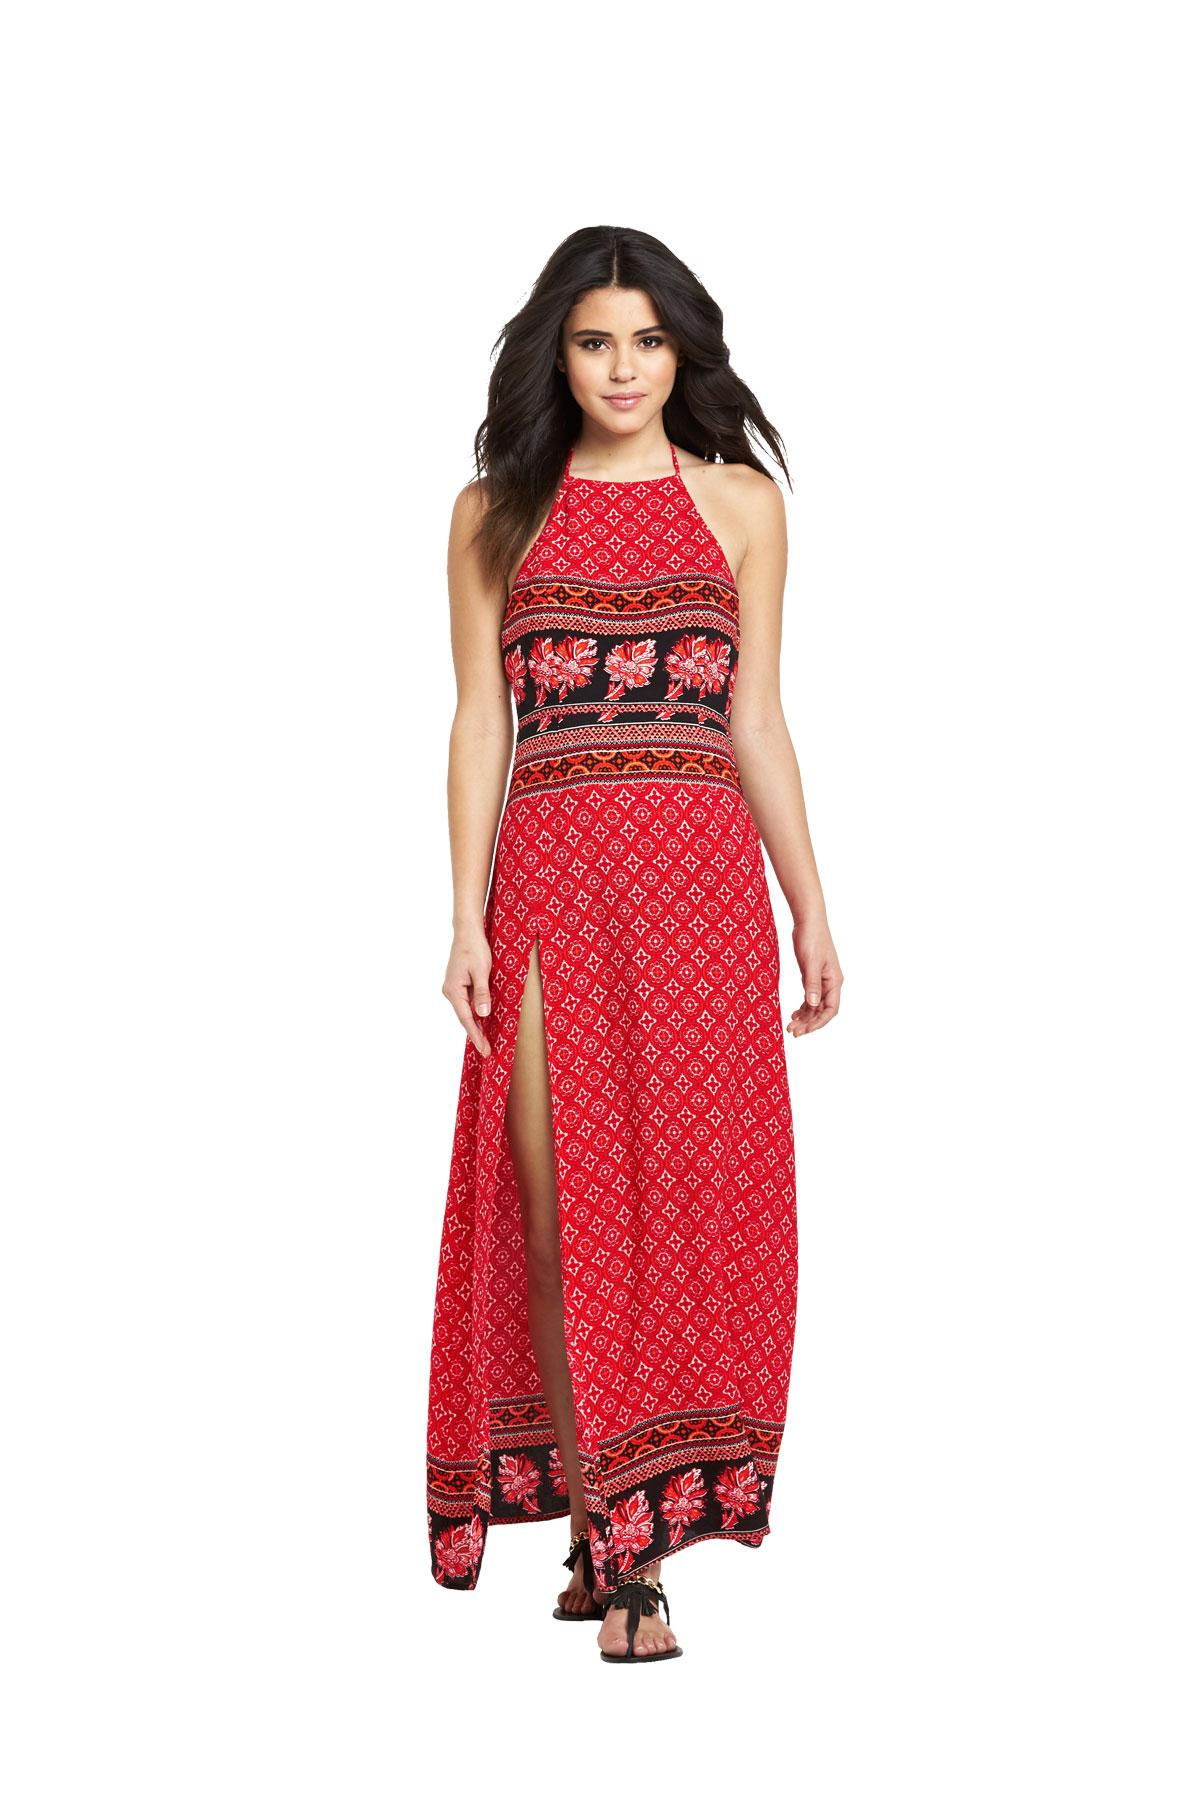 Mink Pink Spice Market Halter Maxi Dress